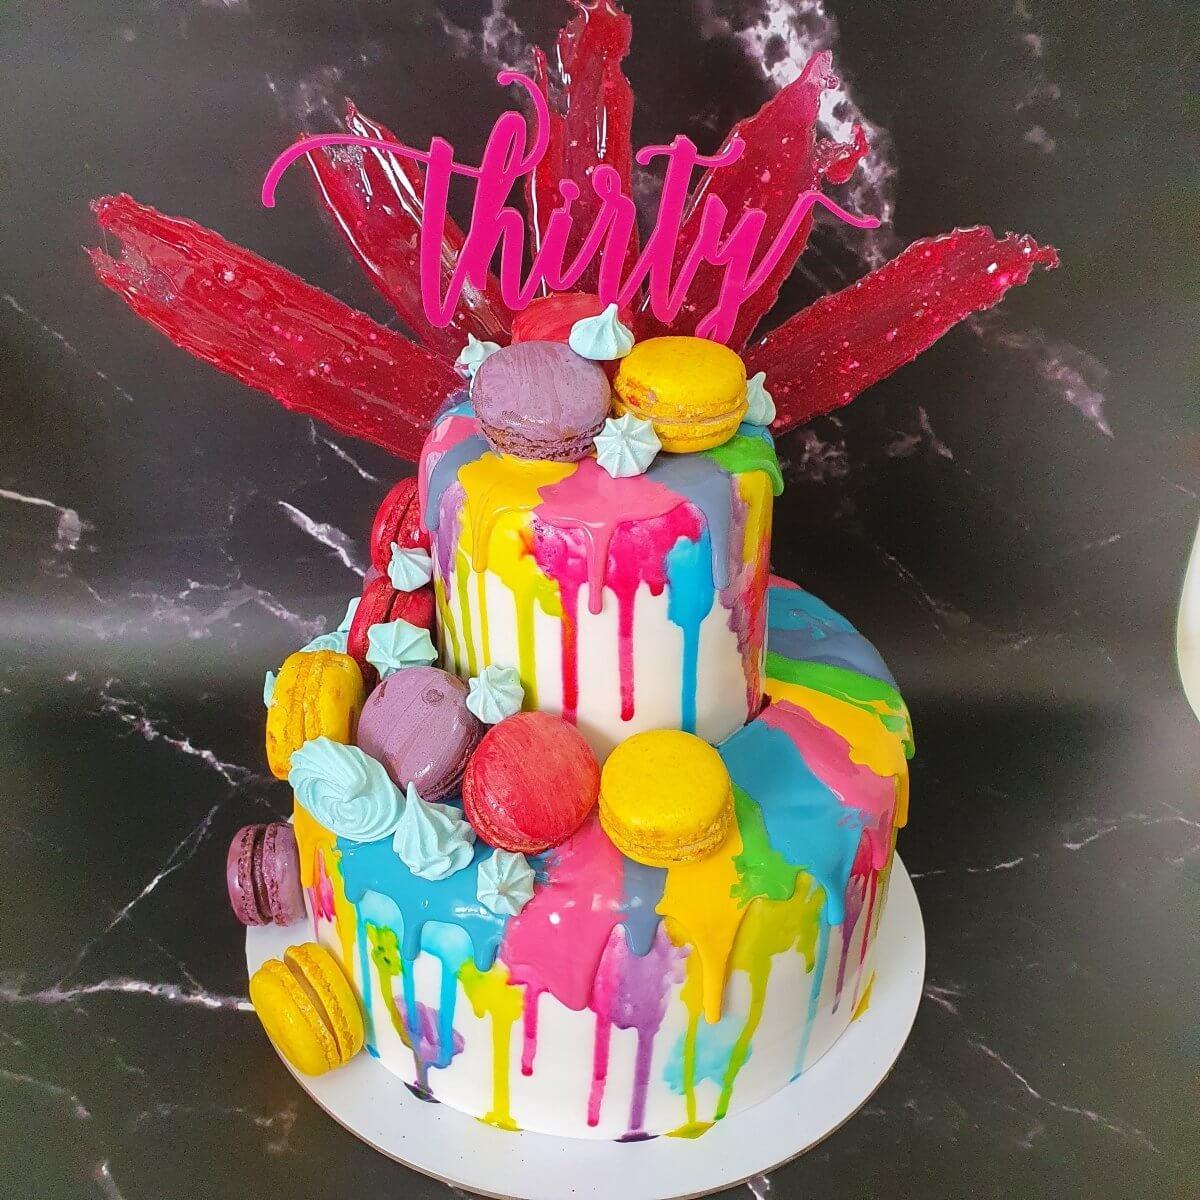 Super Bright Rainbow Pink 30th Birthday Cake Delivered Milton Keynes Cake Maker